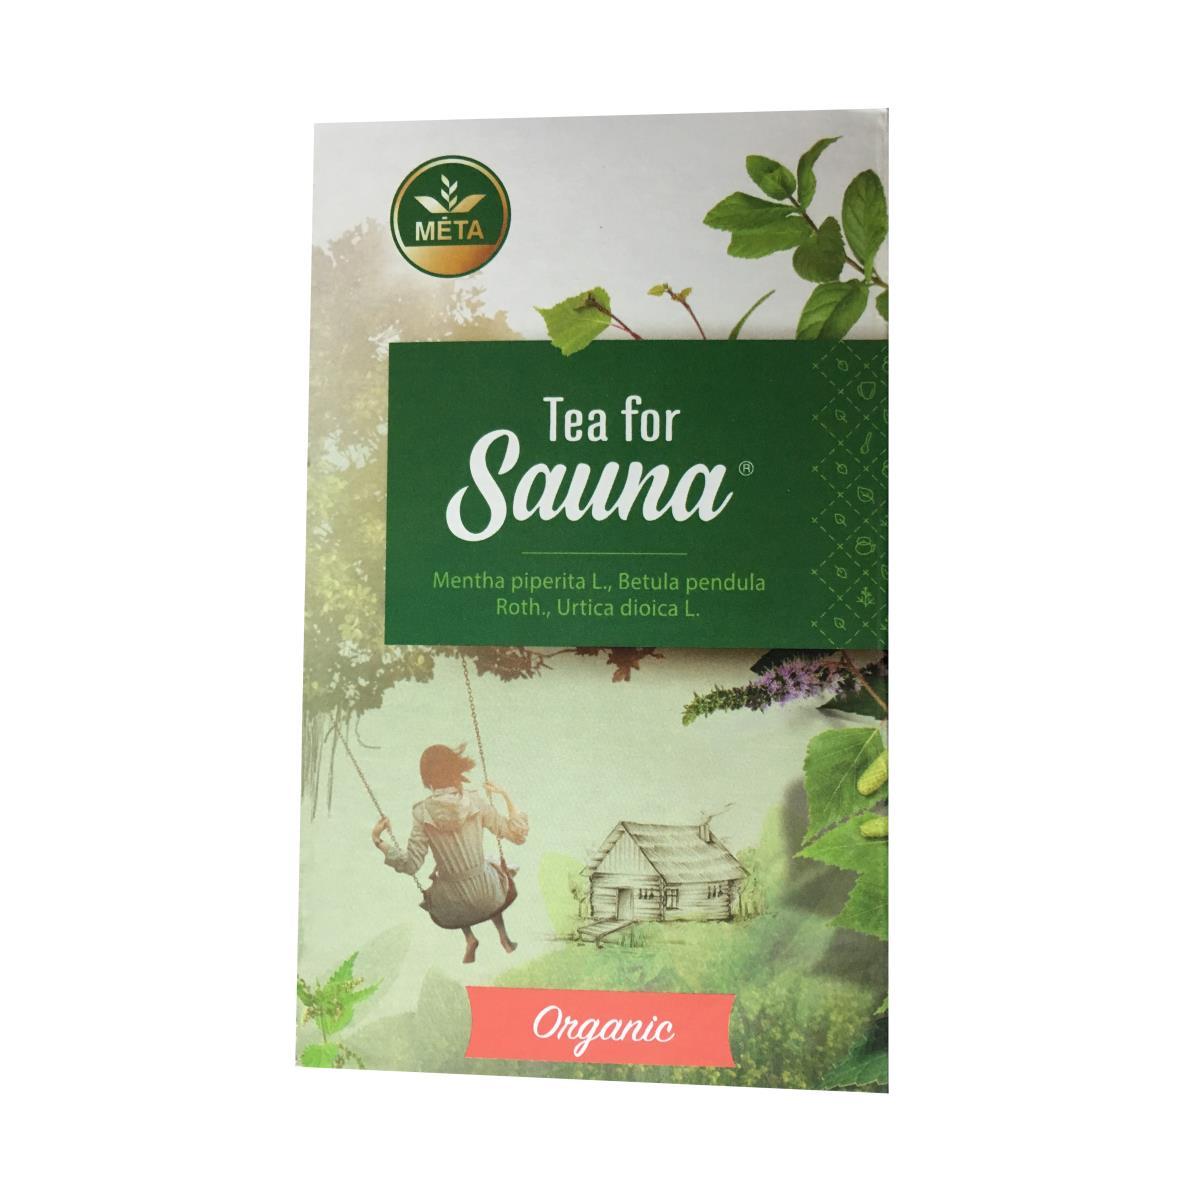 Sauna Tee Saunatee Badtee Naturtee Badteemischung Saunateemischung Durstlöscher ,Meta,000050792505, 4770287121052